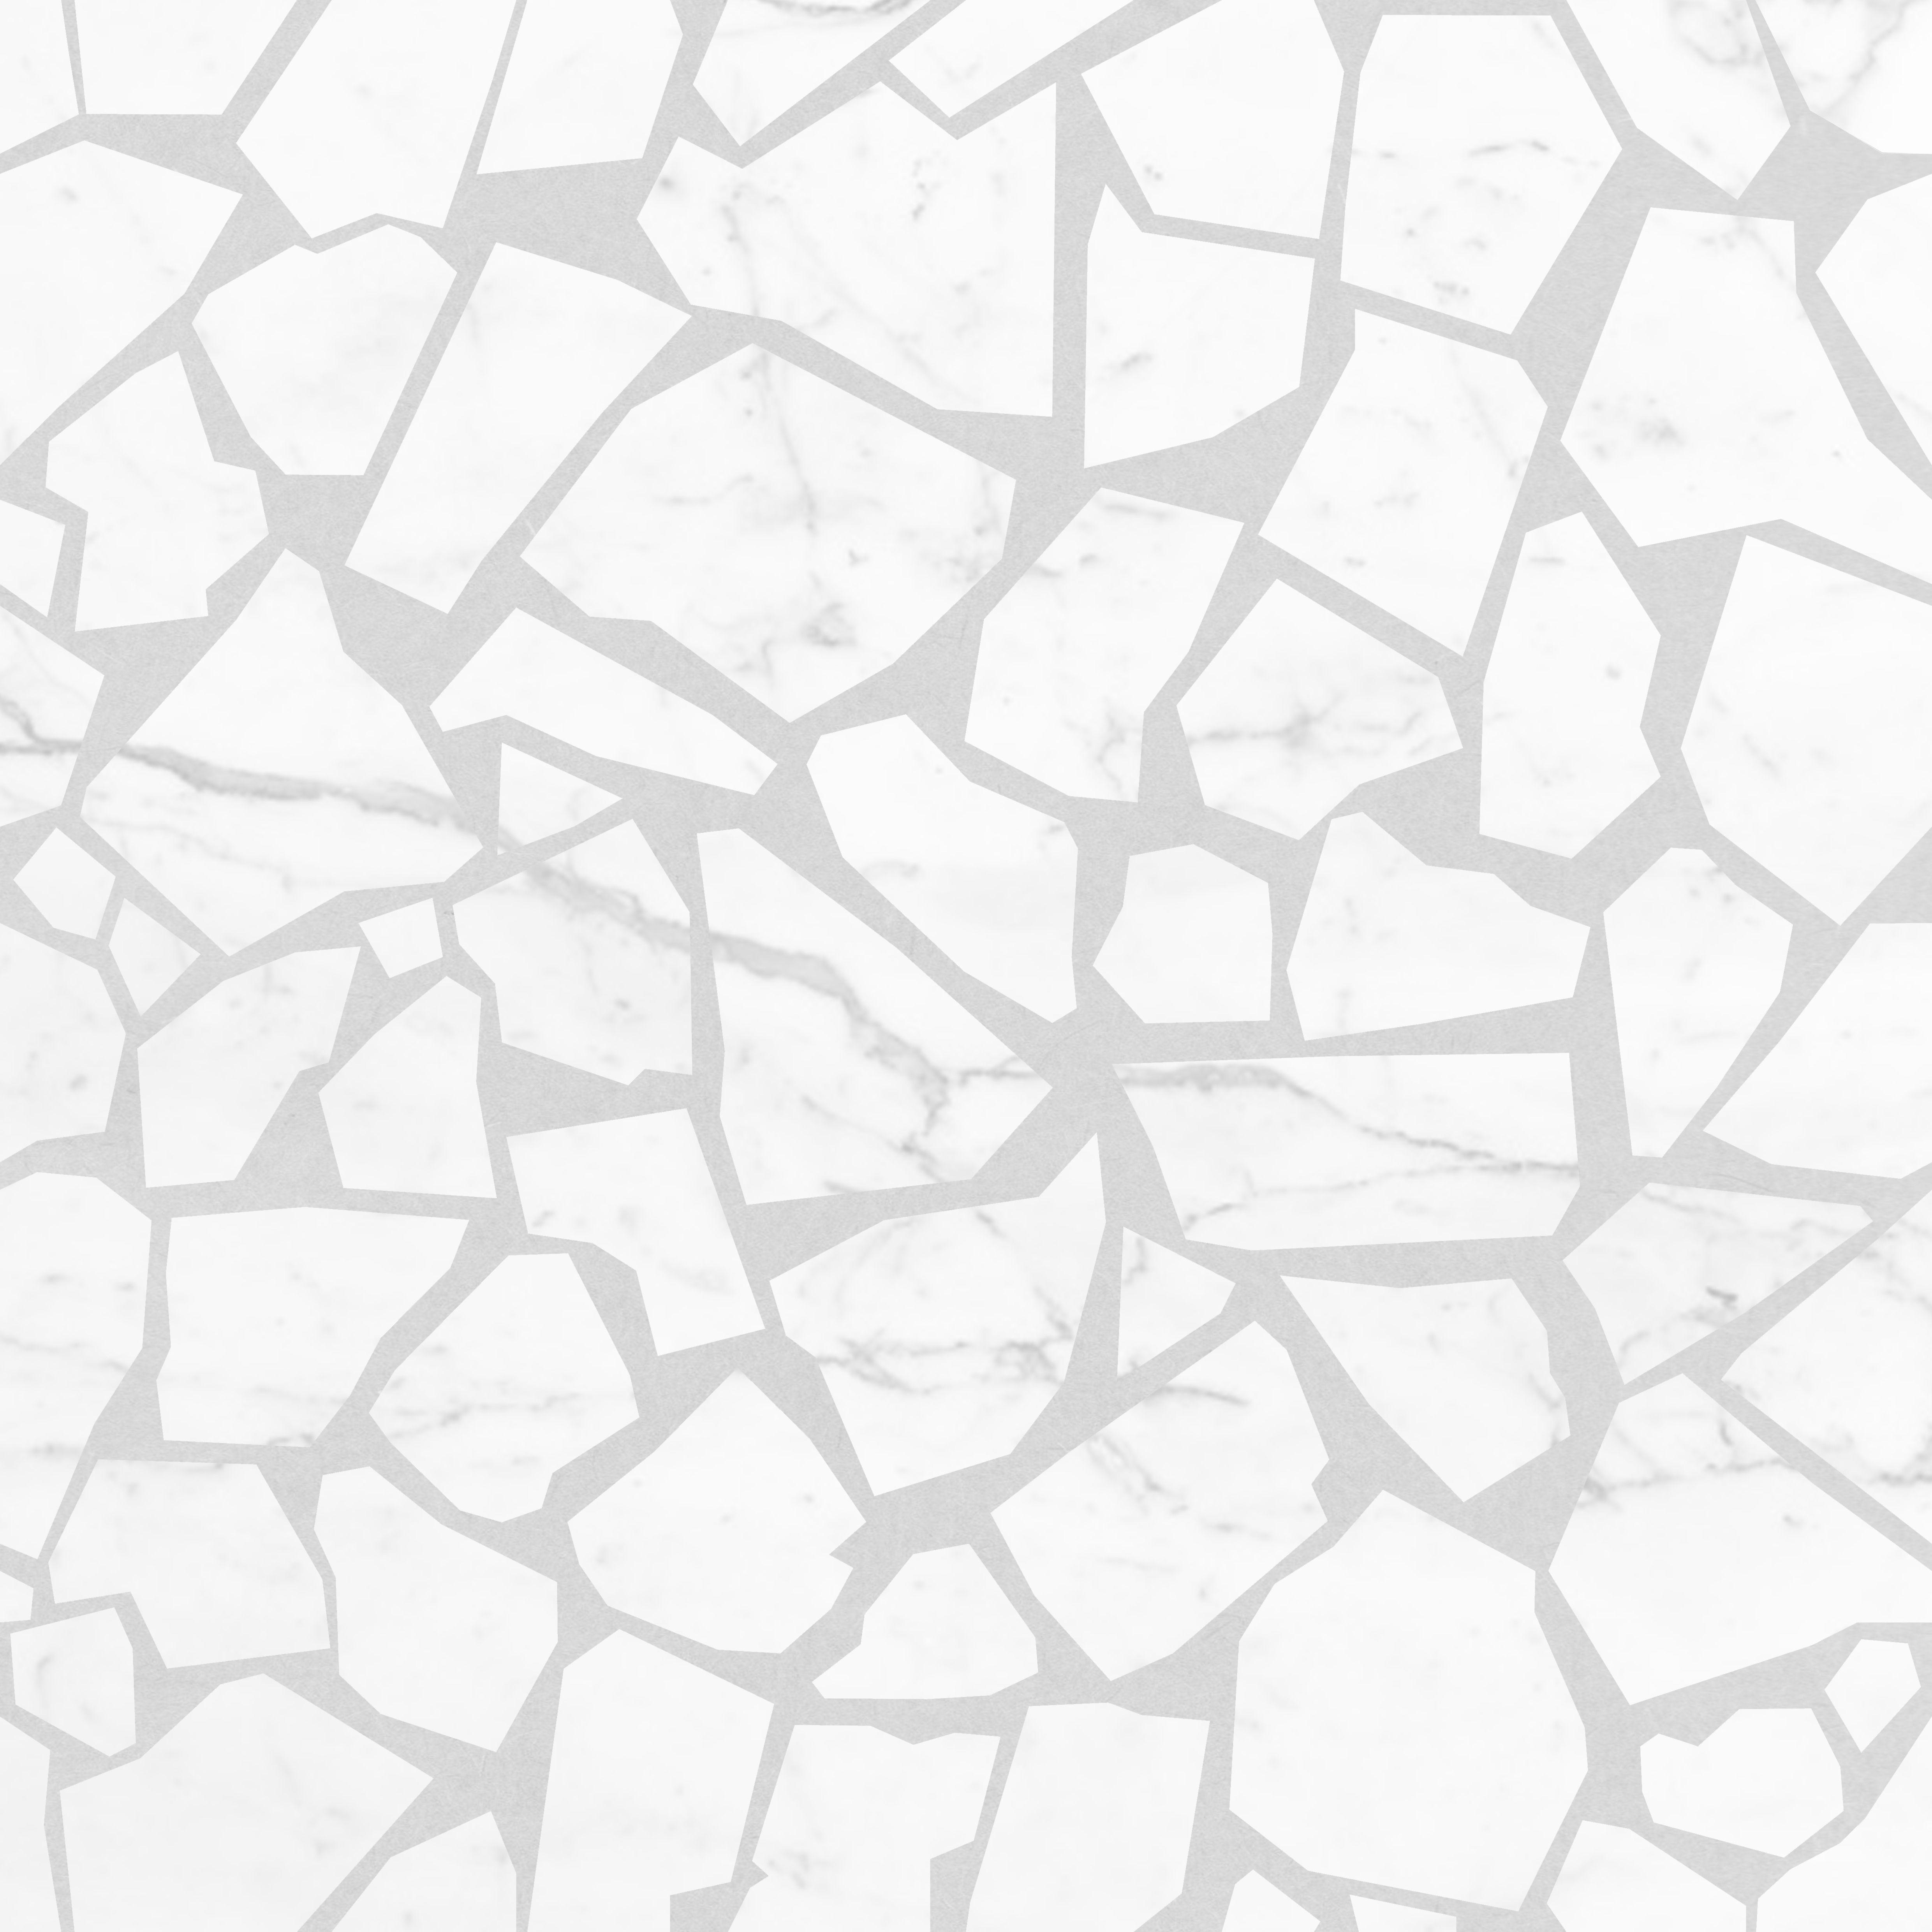 Calacatta gold marble palladiana texture | texture marble ...